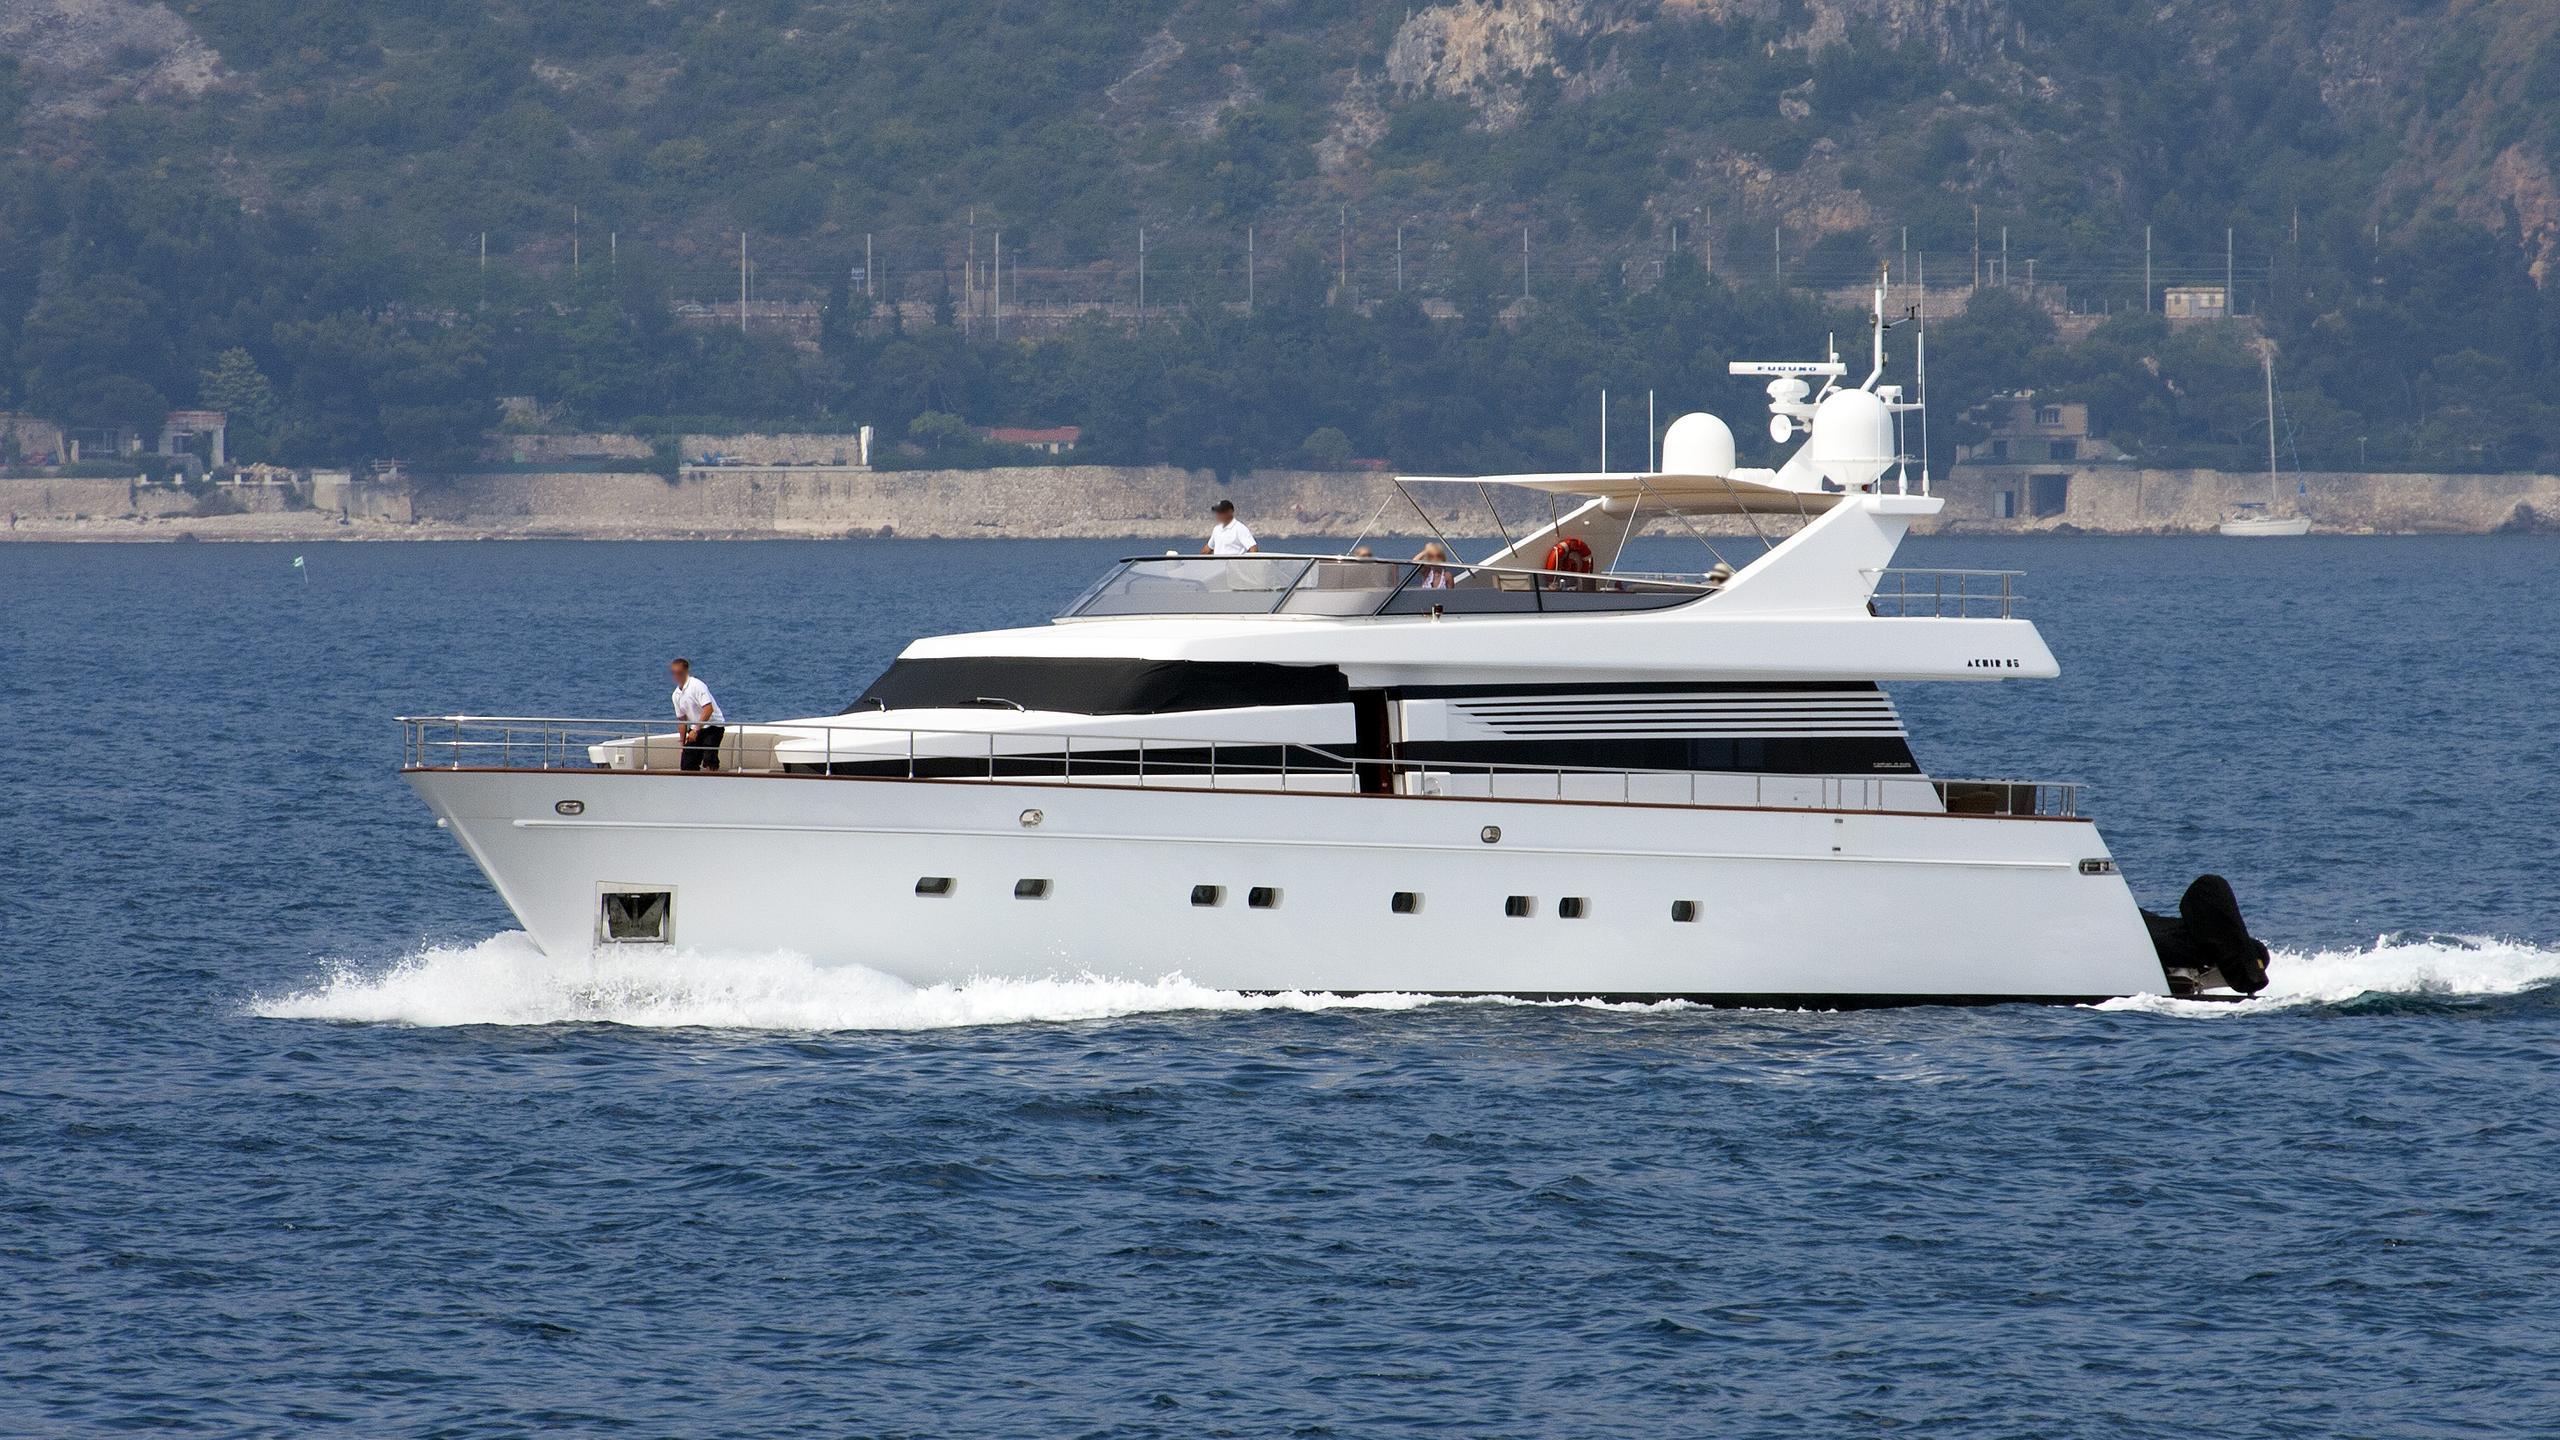 leila-lina-motor-yacht-cantieri-di-pisa-akhir-26s-2005-26m-profile